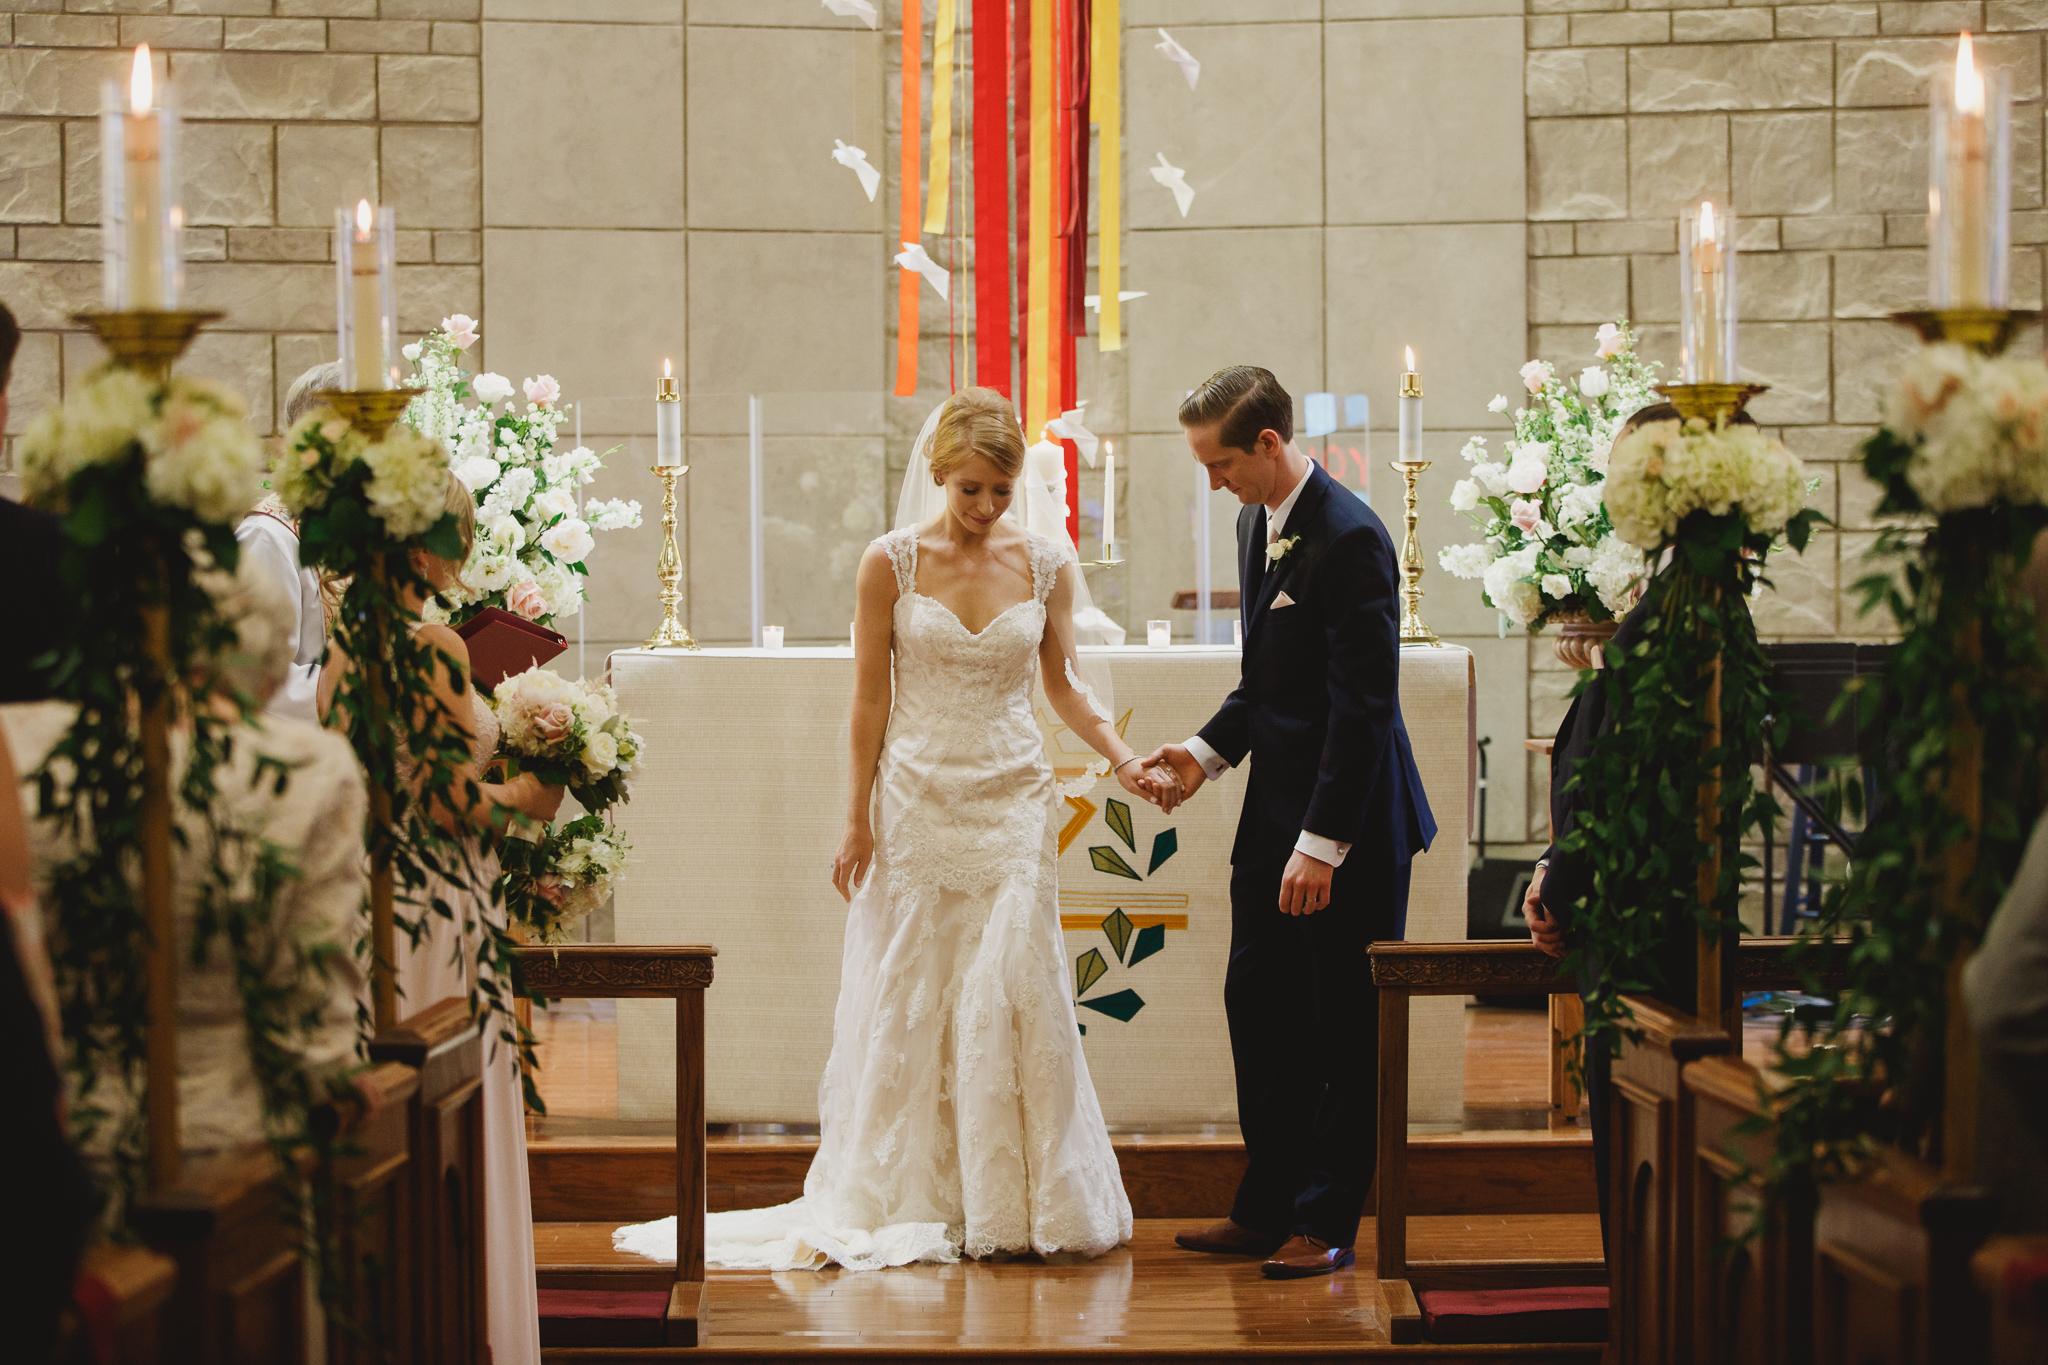 Michael and Kelly - the ashton depot - wedding DFW - wedding photographer- elizalde photography (49 of 150).jpg